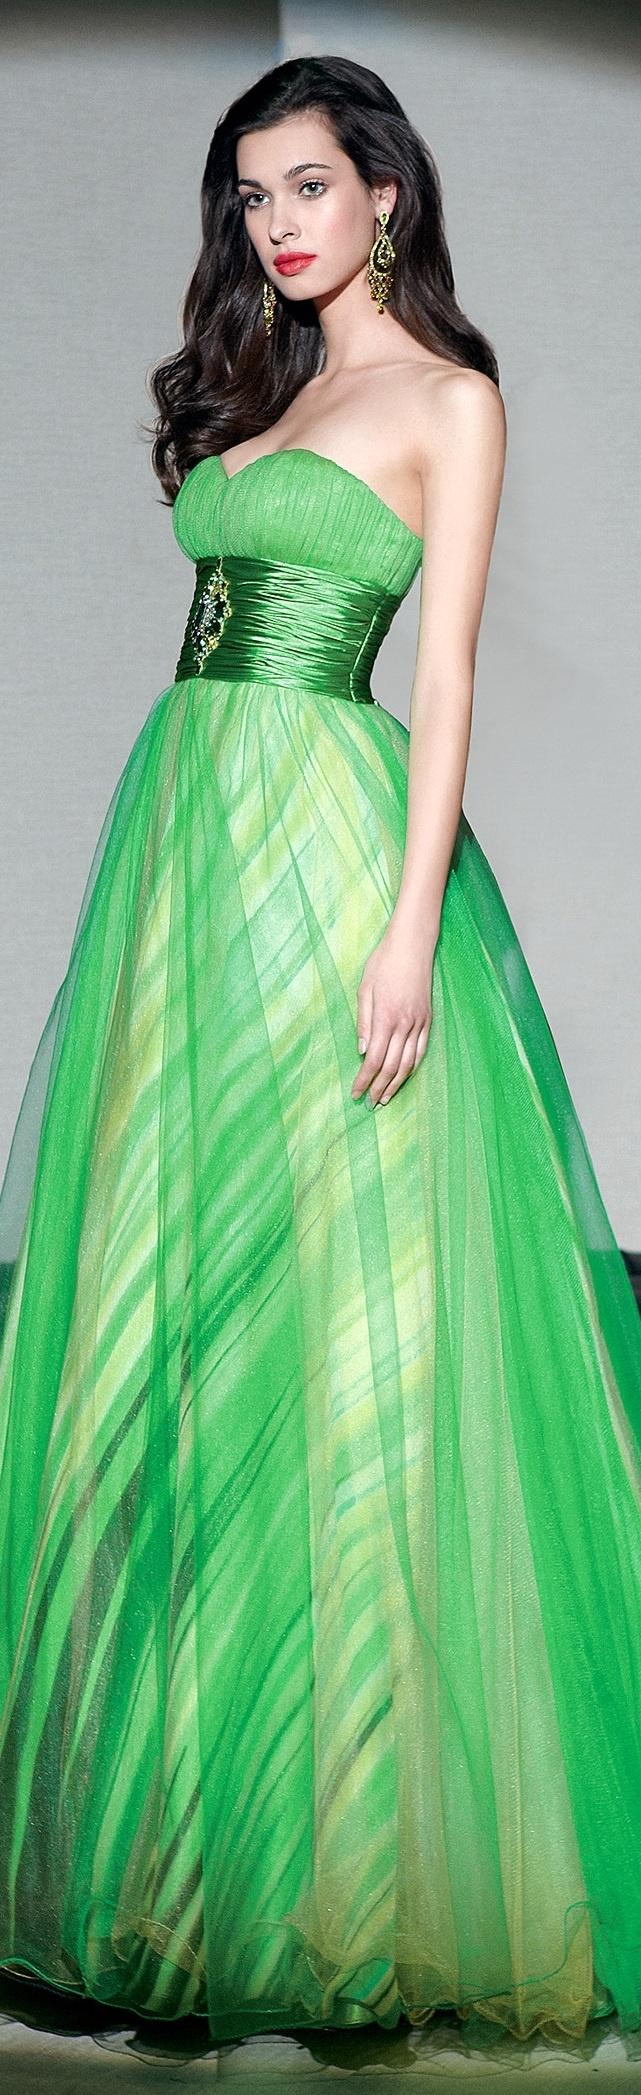 Wedding - Alyce Paris Couture 2013